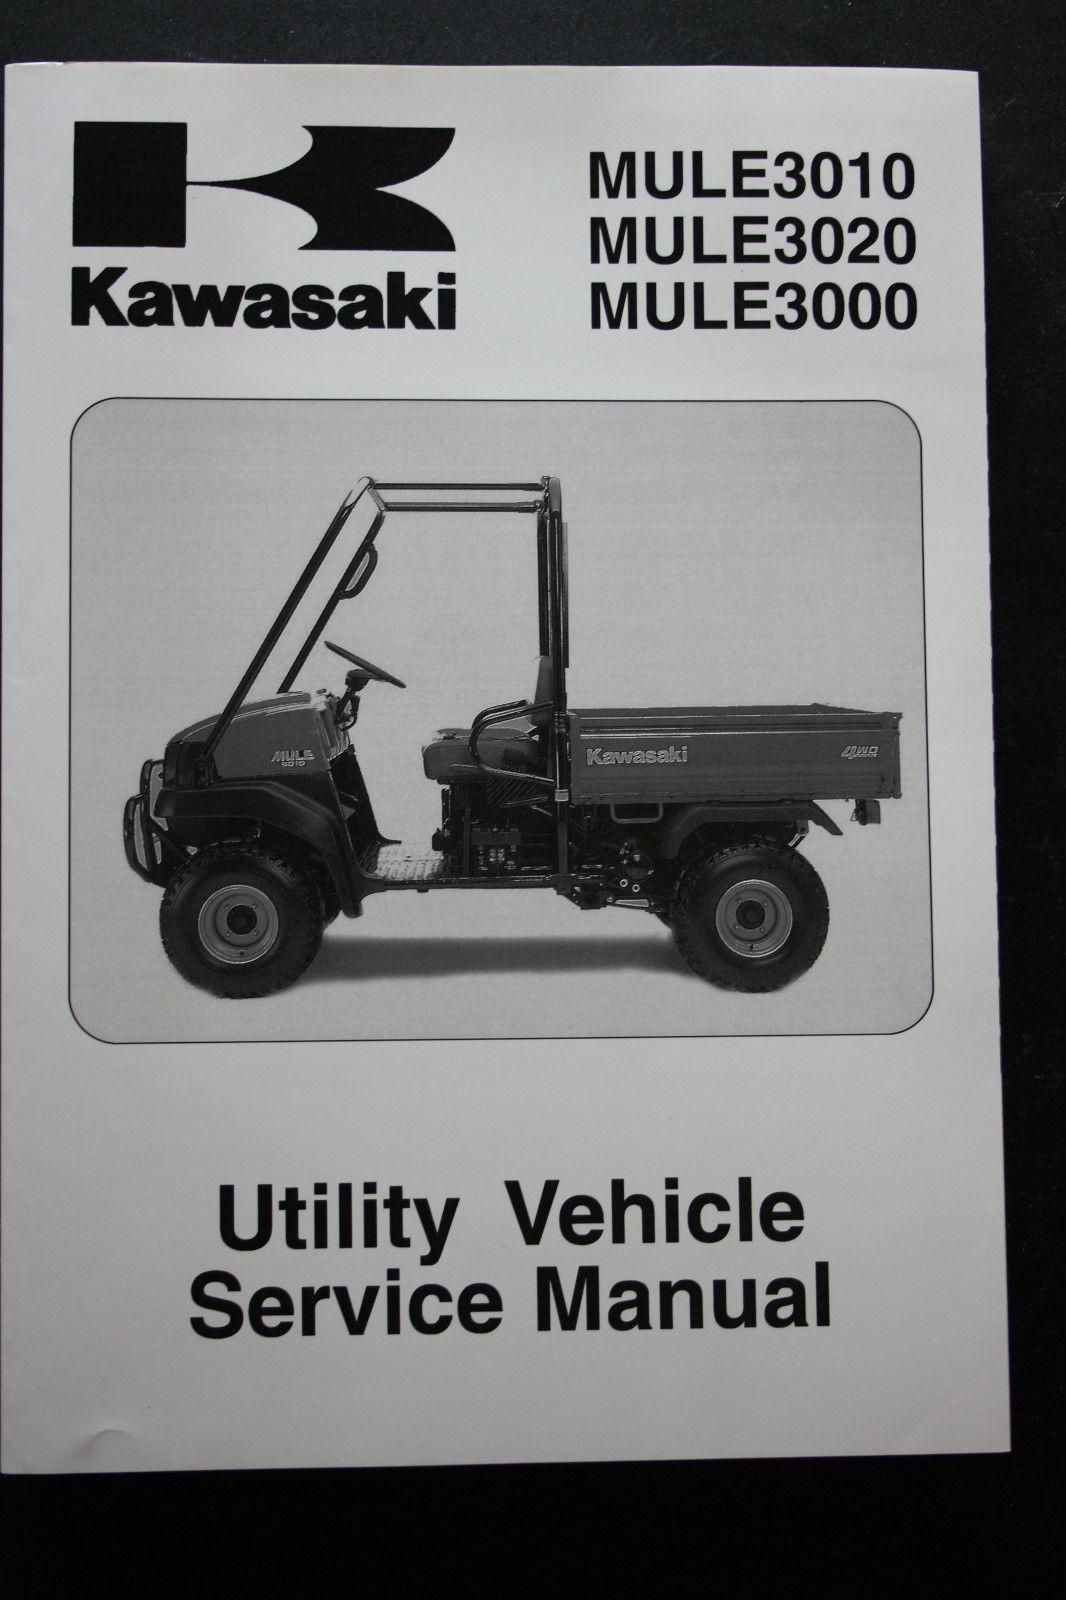 hight resolution of genuine kawasaki utility service workshop manual 01 08 mule 3010 3020 3000 kawasaki